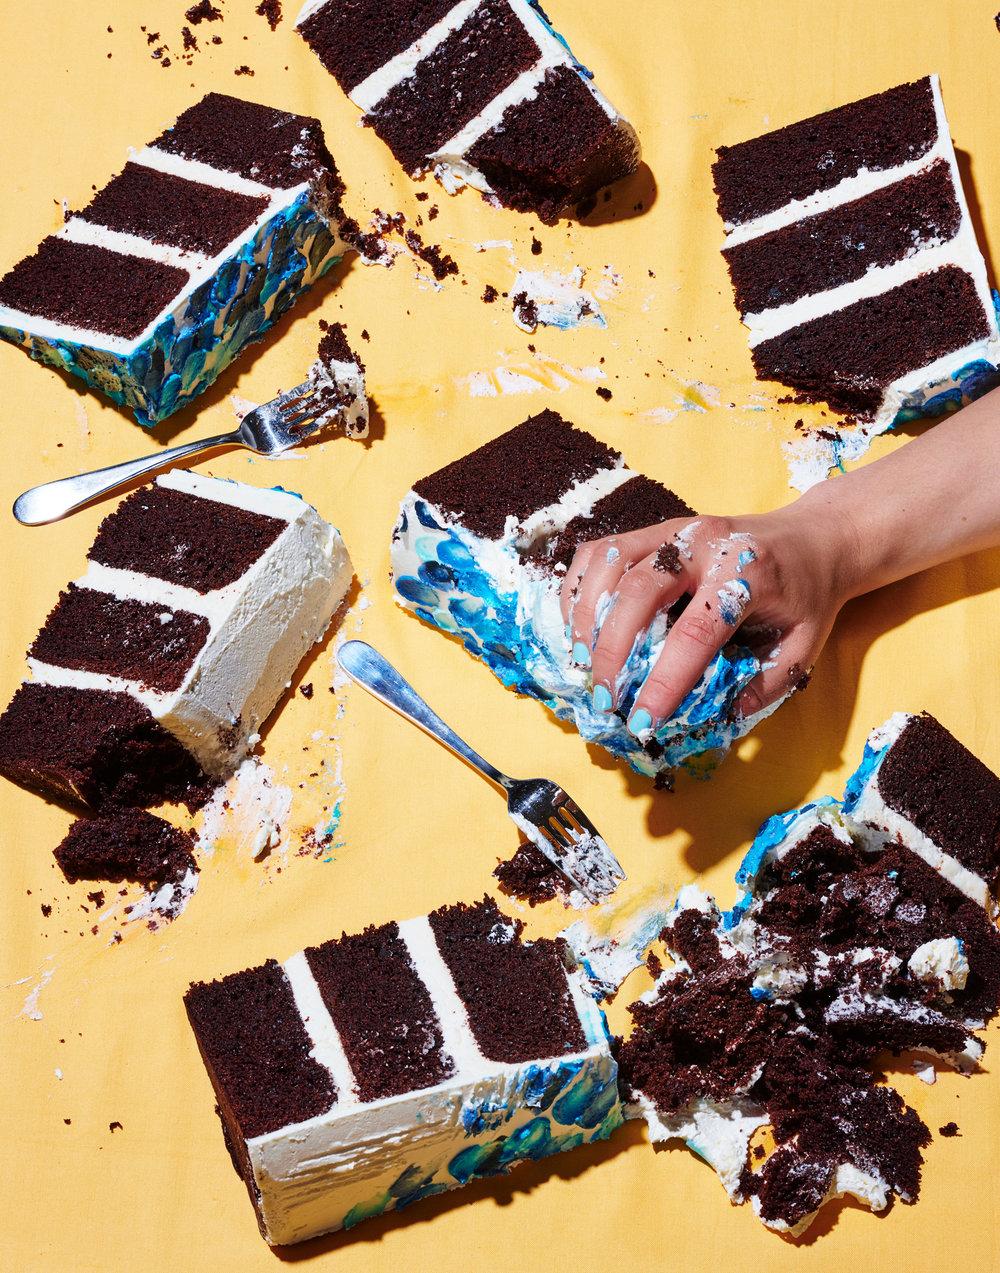 05142018_SweetStuff_CakeHandHero (1).jpg